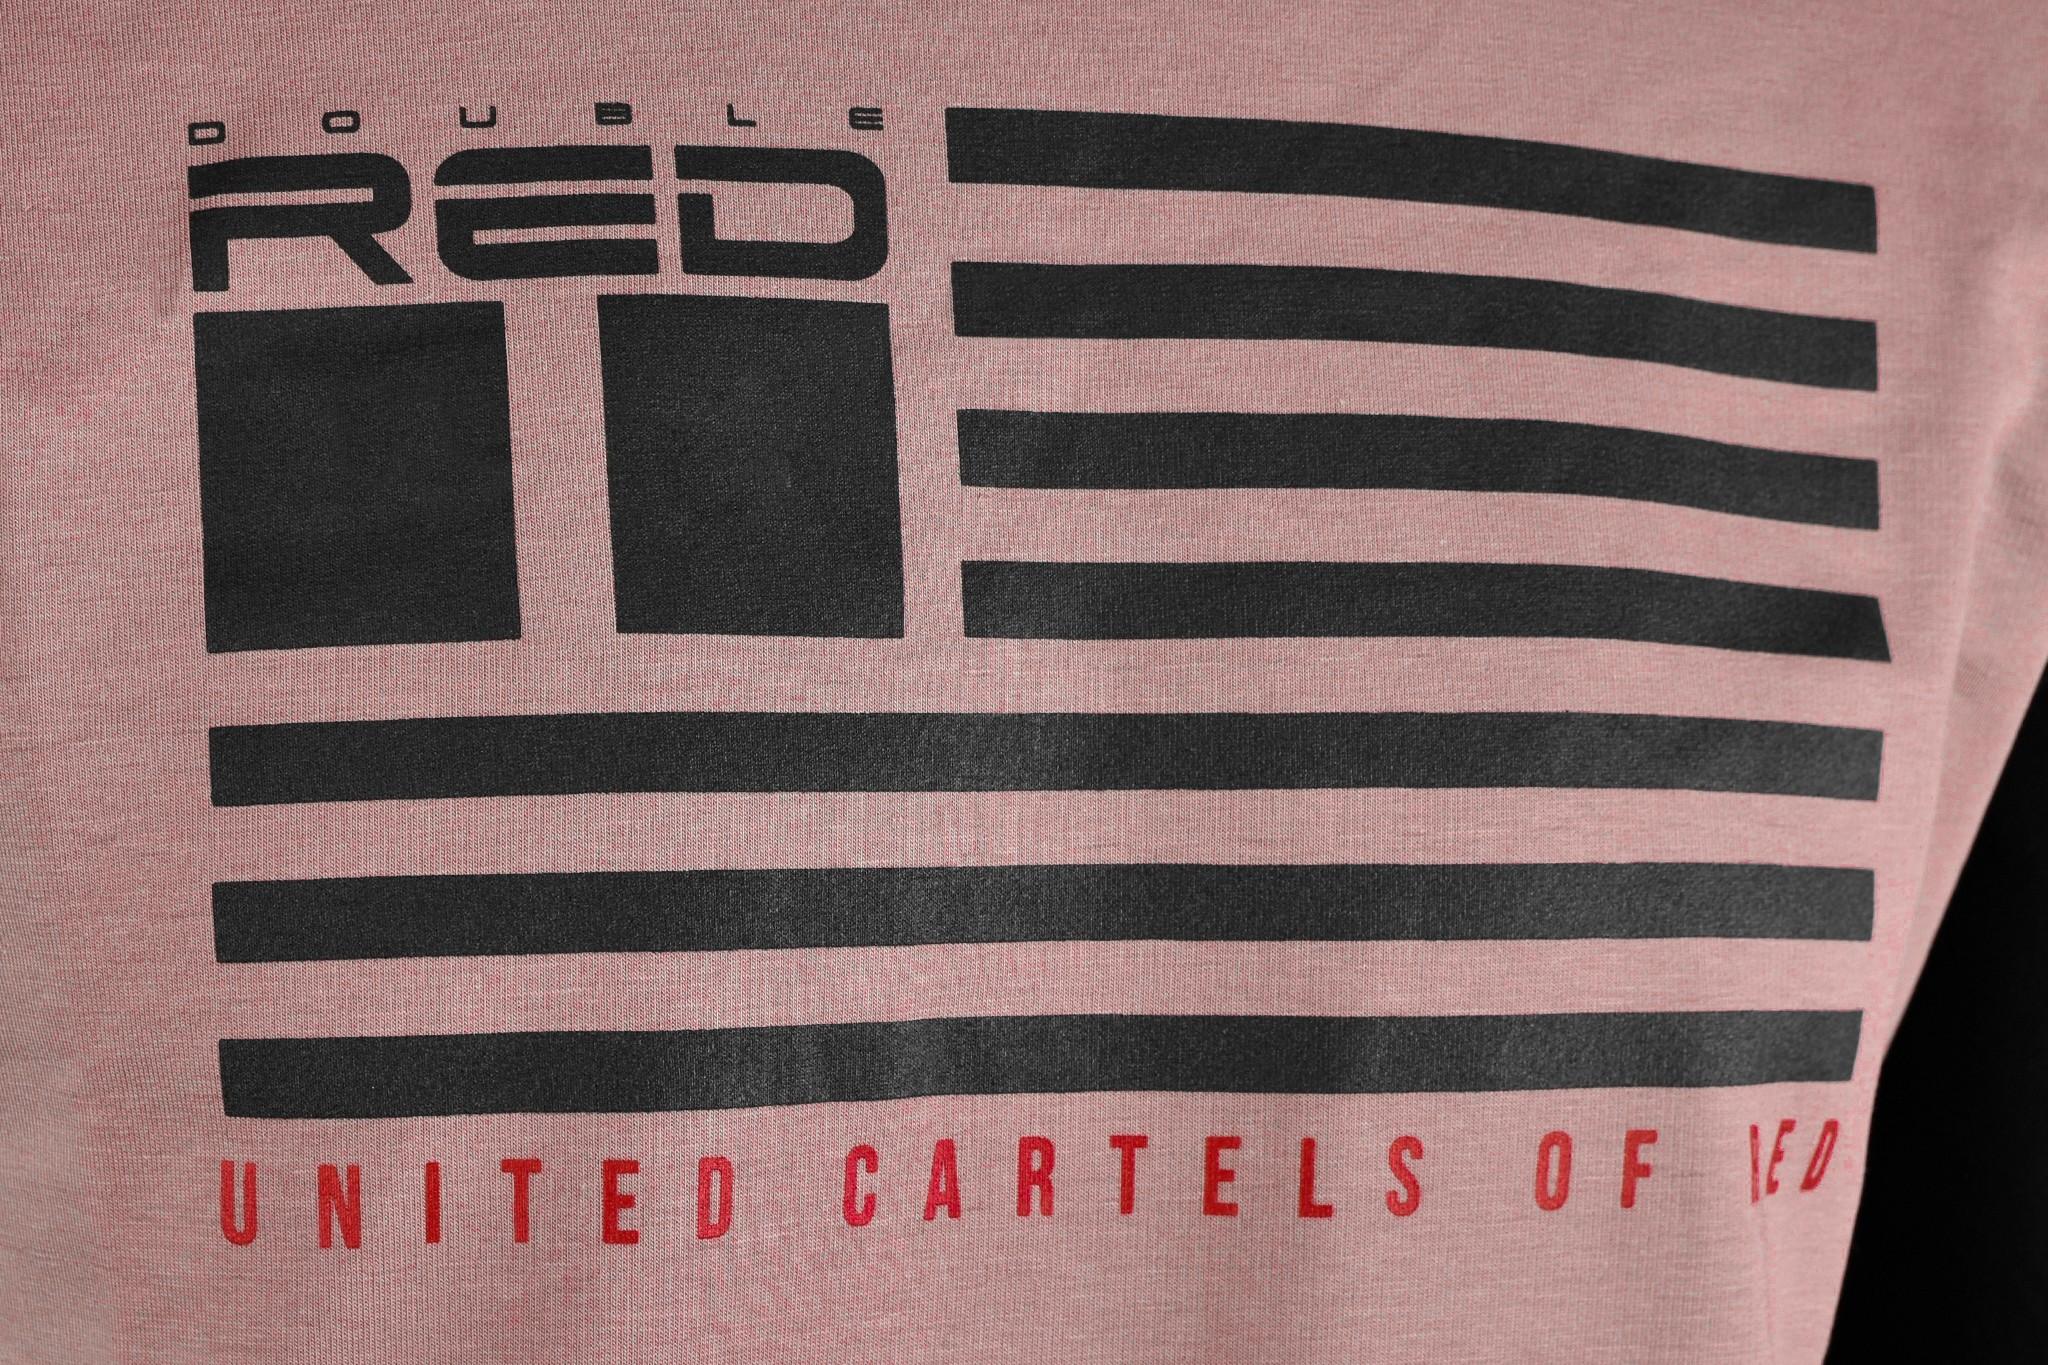 United Cartels Of Red UCR Beige Sweatshirt